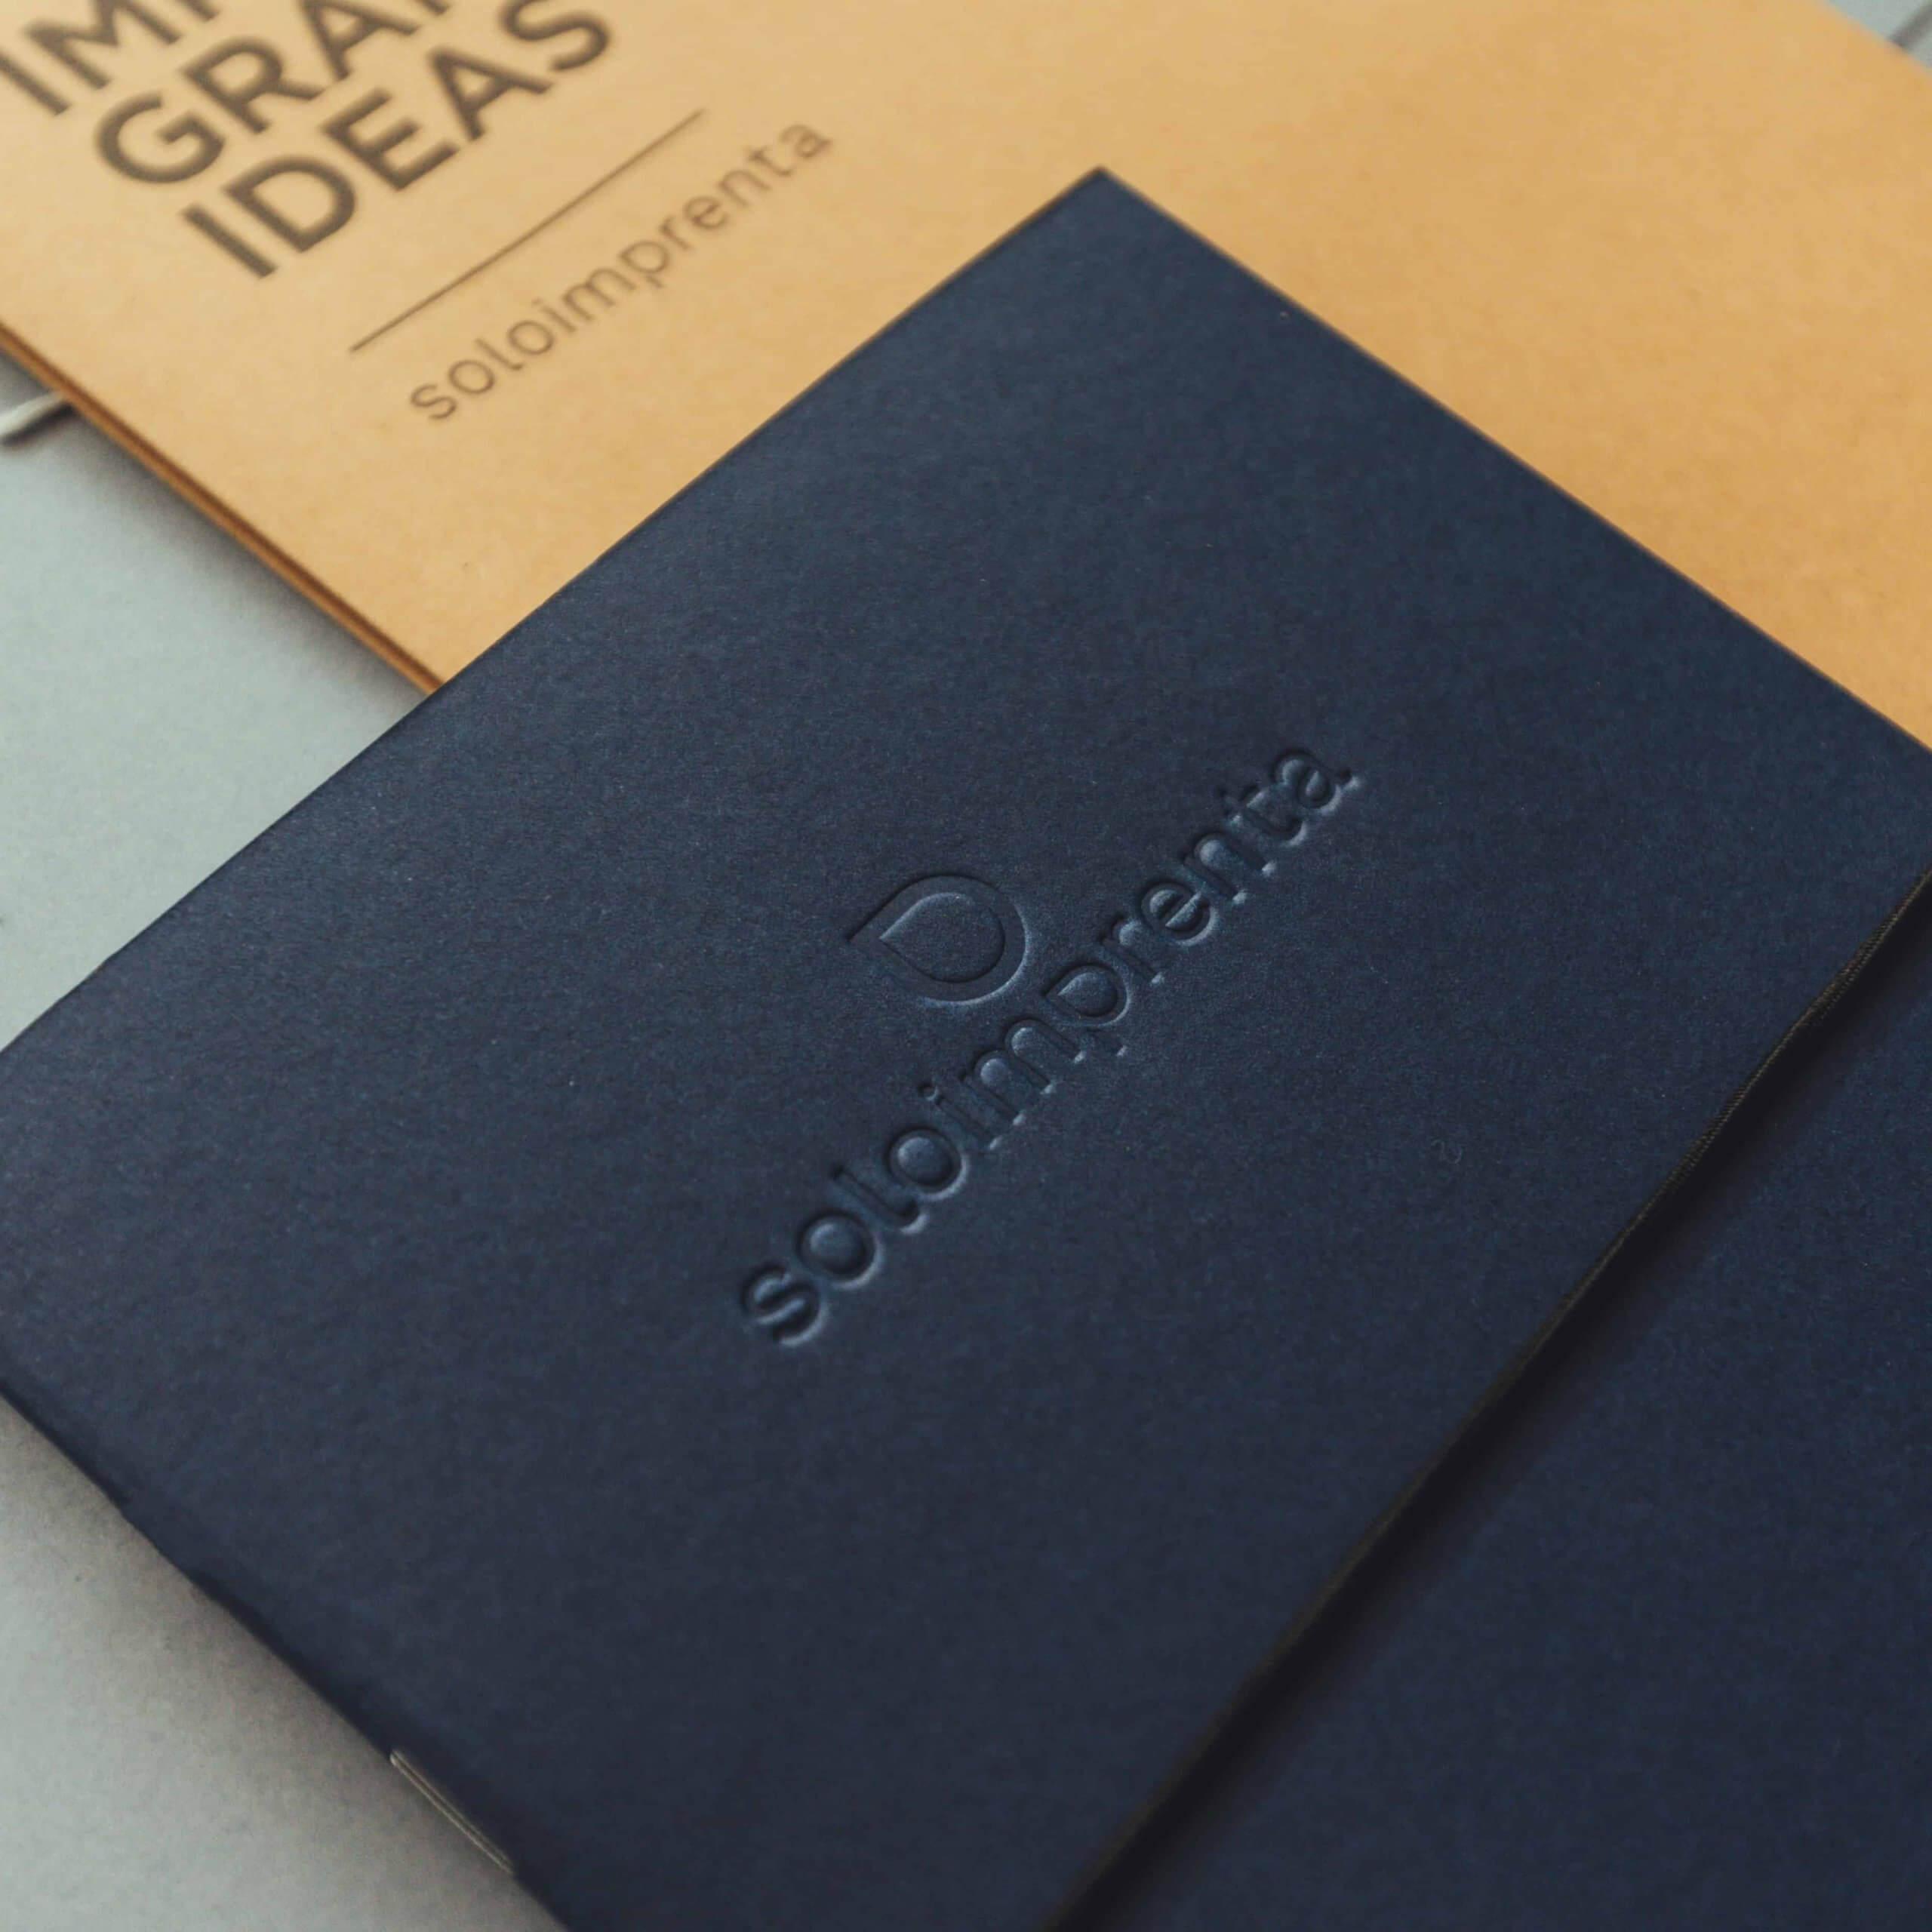 packaging soloimprenta